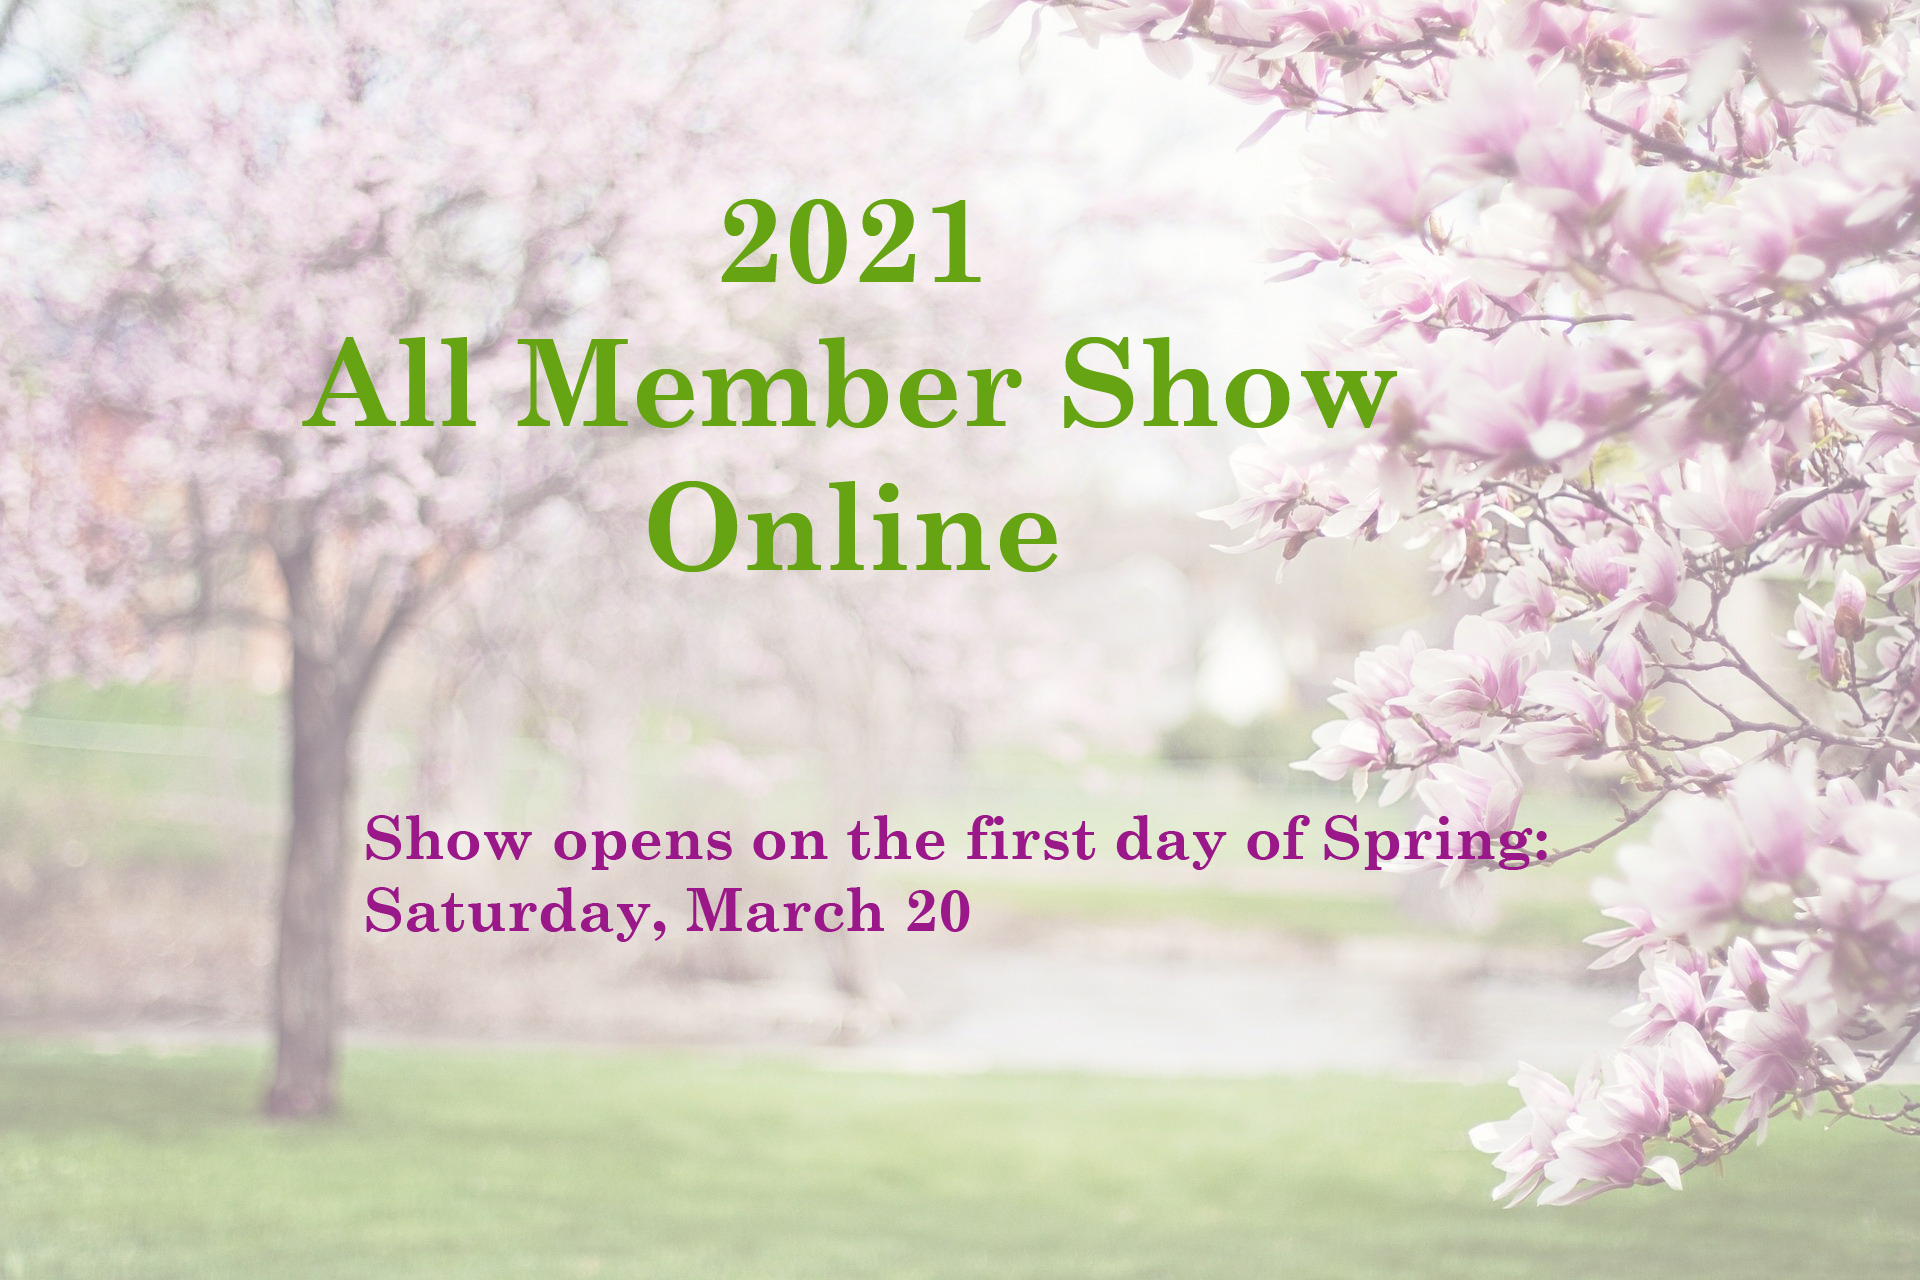 2021 All Member Show Online